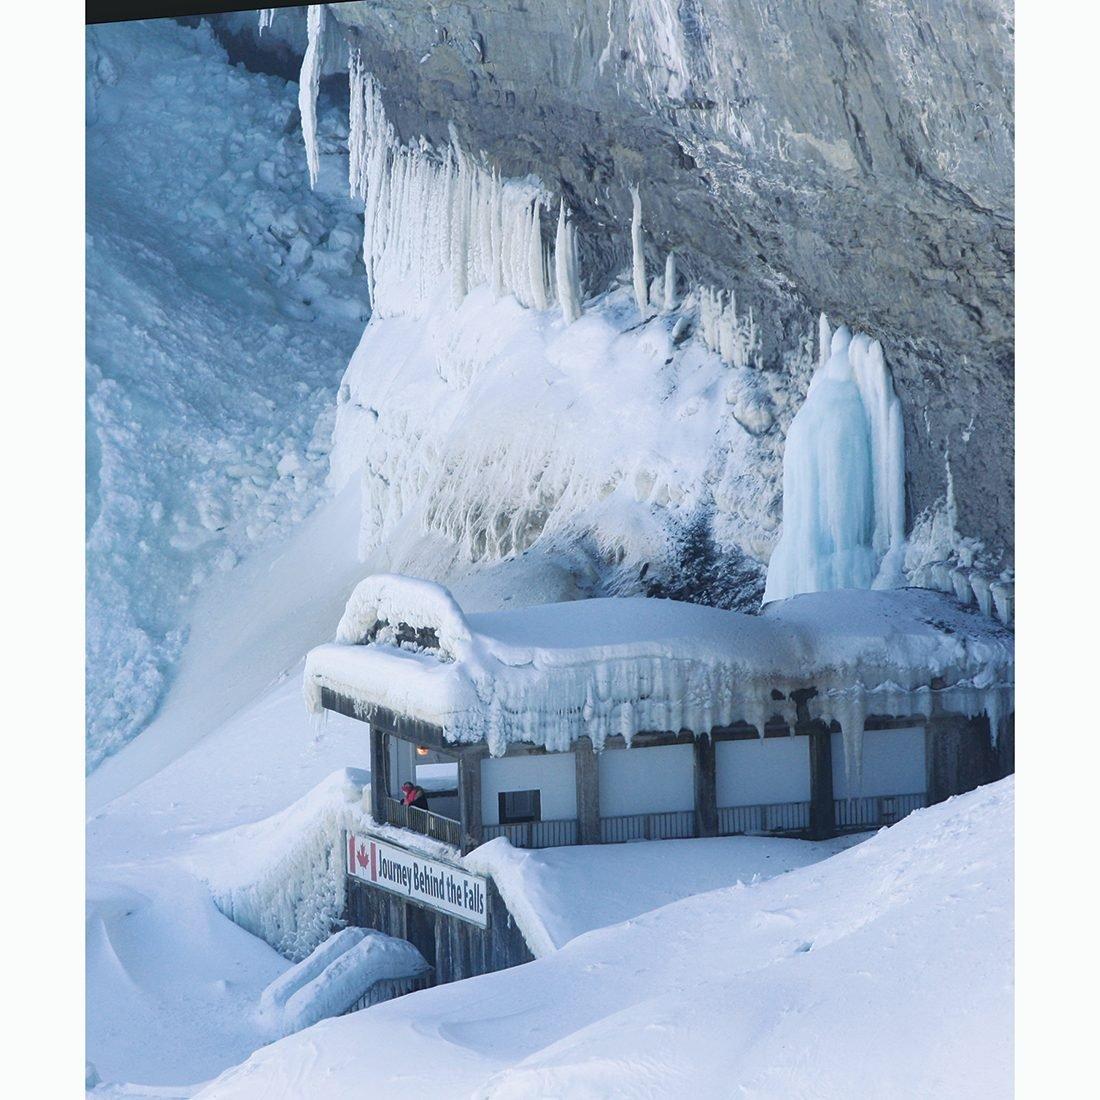 Niagara Falls In Winter - Journey Behind The Falls